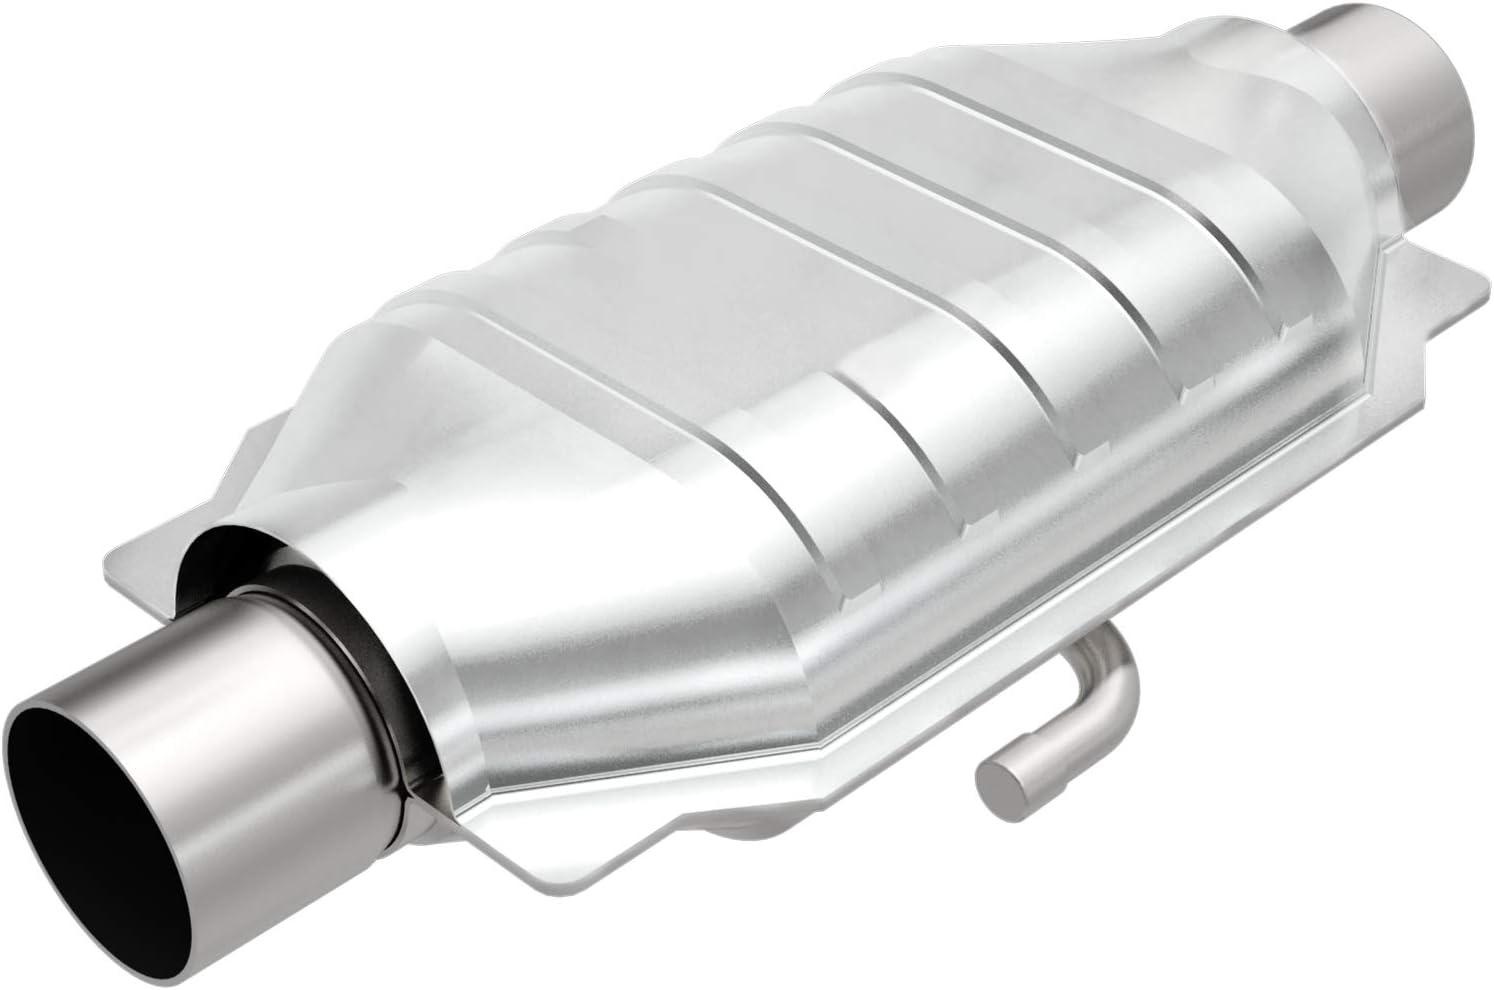 Non CARB Compliant MagnaFlow 94215 Universal Catalytic Converter